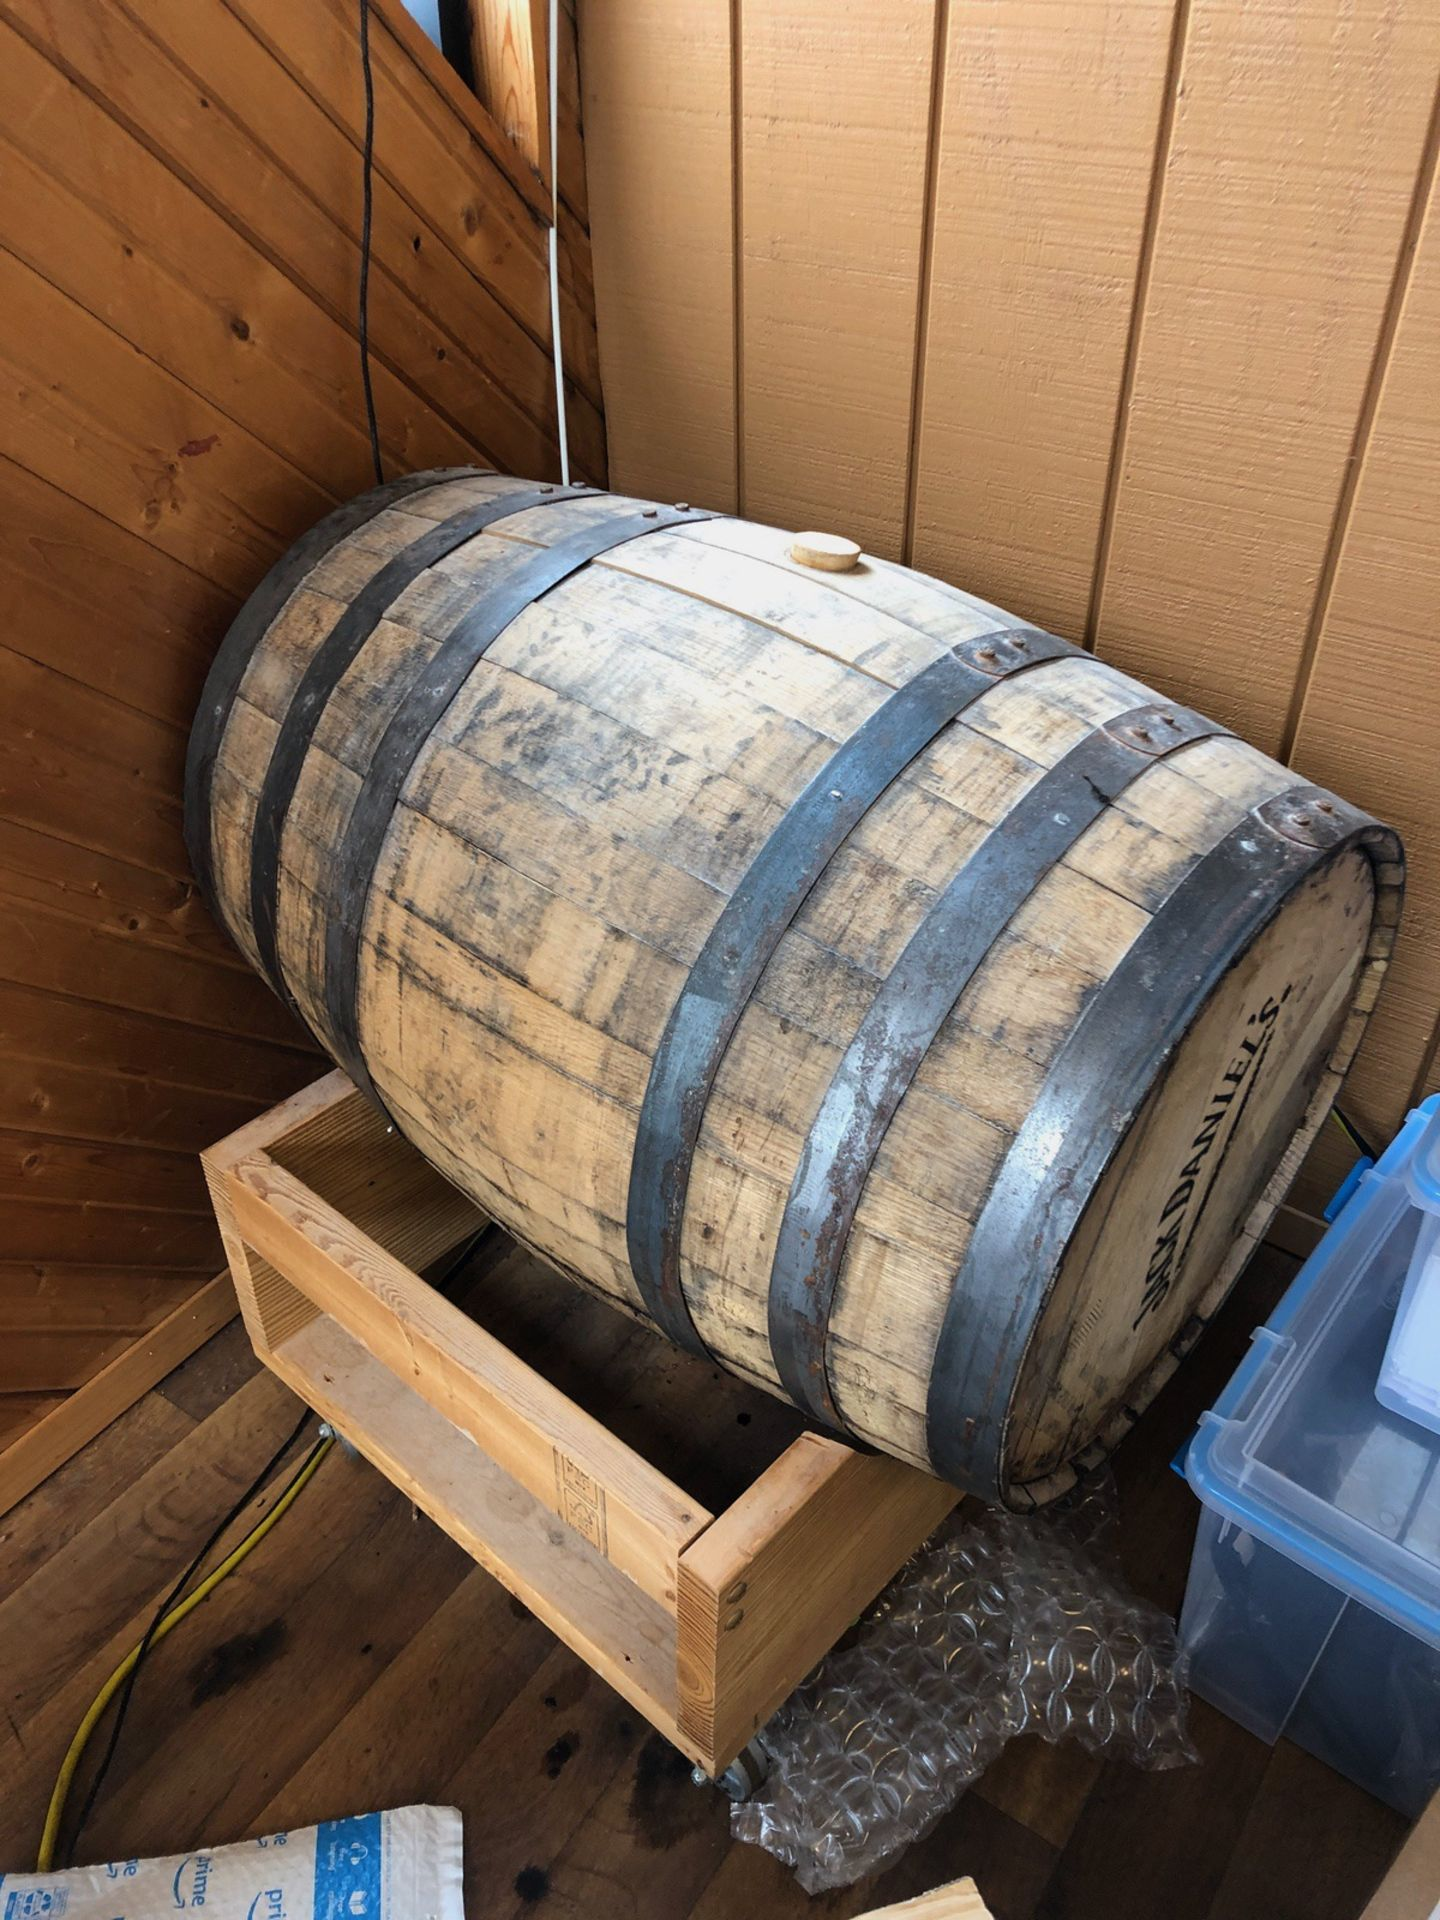 Lot 58 - (2) Oak Barrels and (2) Fusti Cans | Rig Fee: $50 or HC